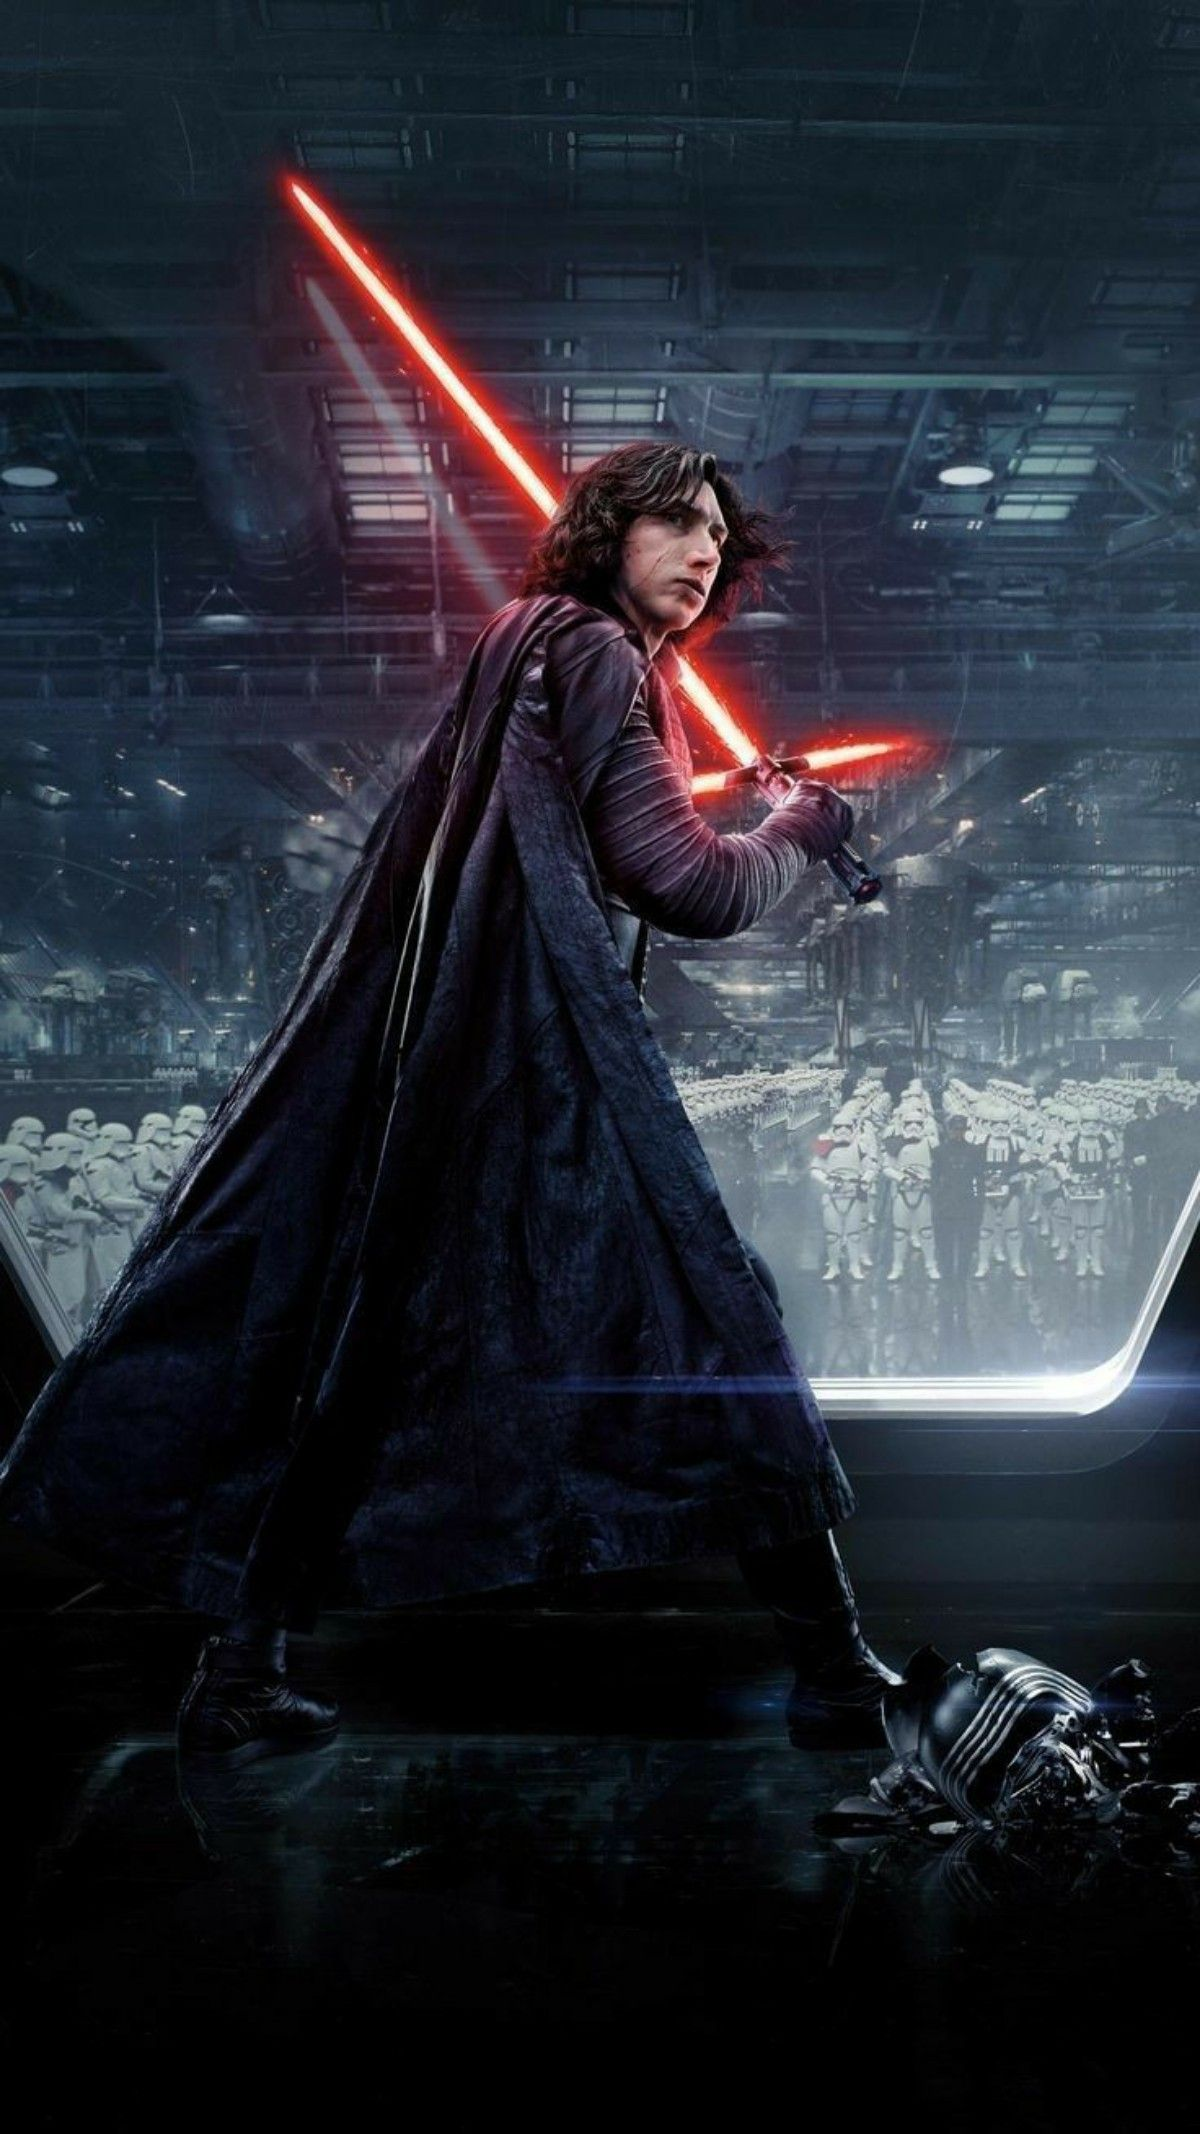 Ben Solo Aka Kylo Ren Phone Wallpaper Starwars Kyloren Reylo Di 2020 Star Wars Wallpaper Ponsel Iphone